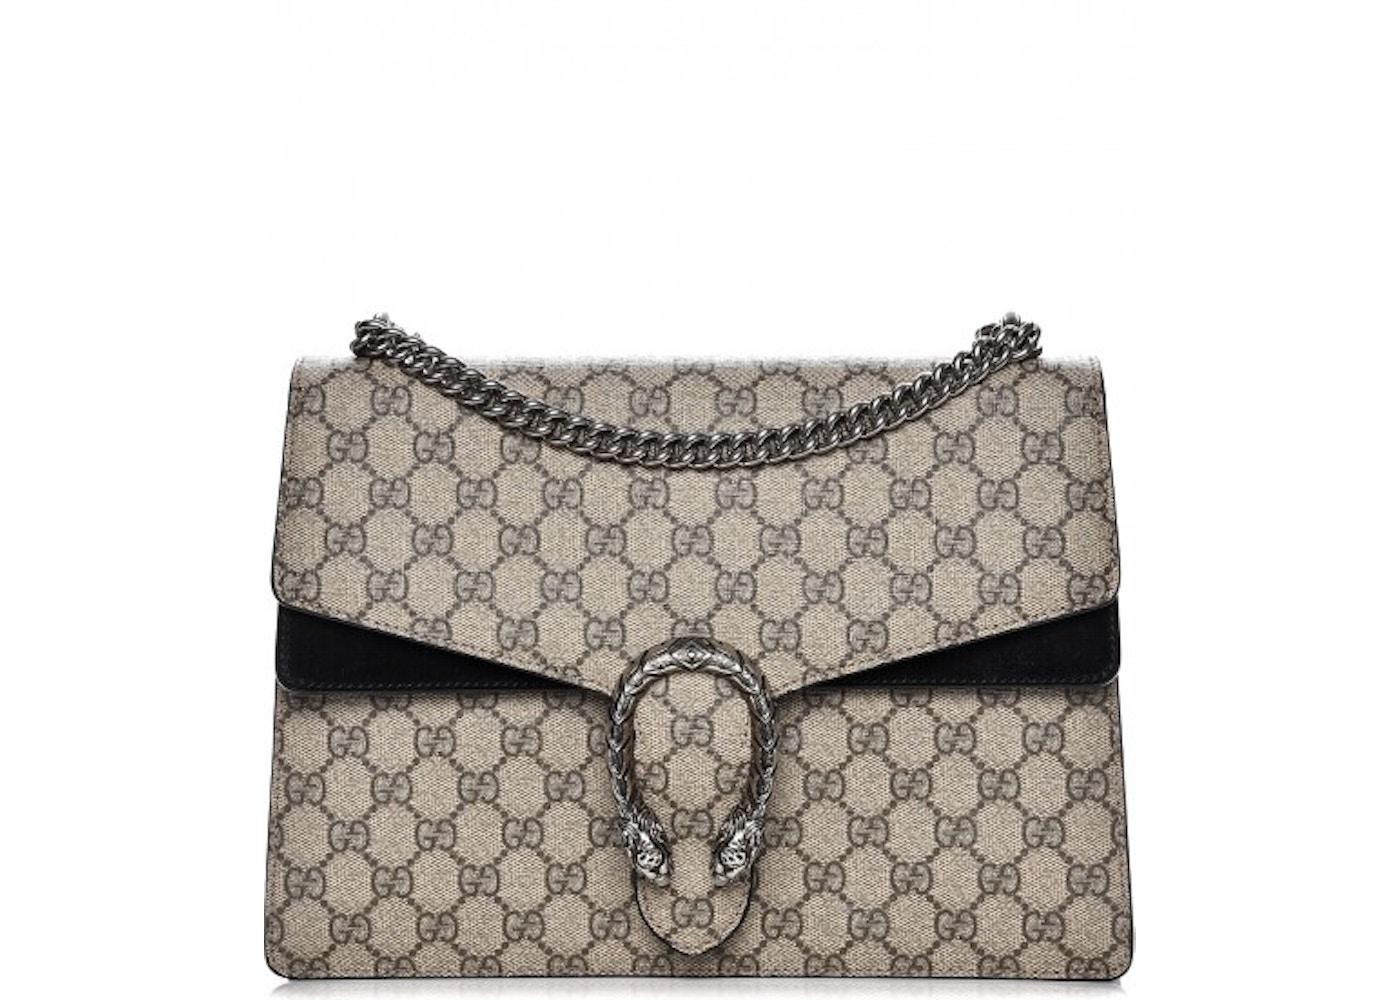 c8ea05ddc Gucci Dionysus Shoulder Monogram GG Supreme Medium Black/Beige